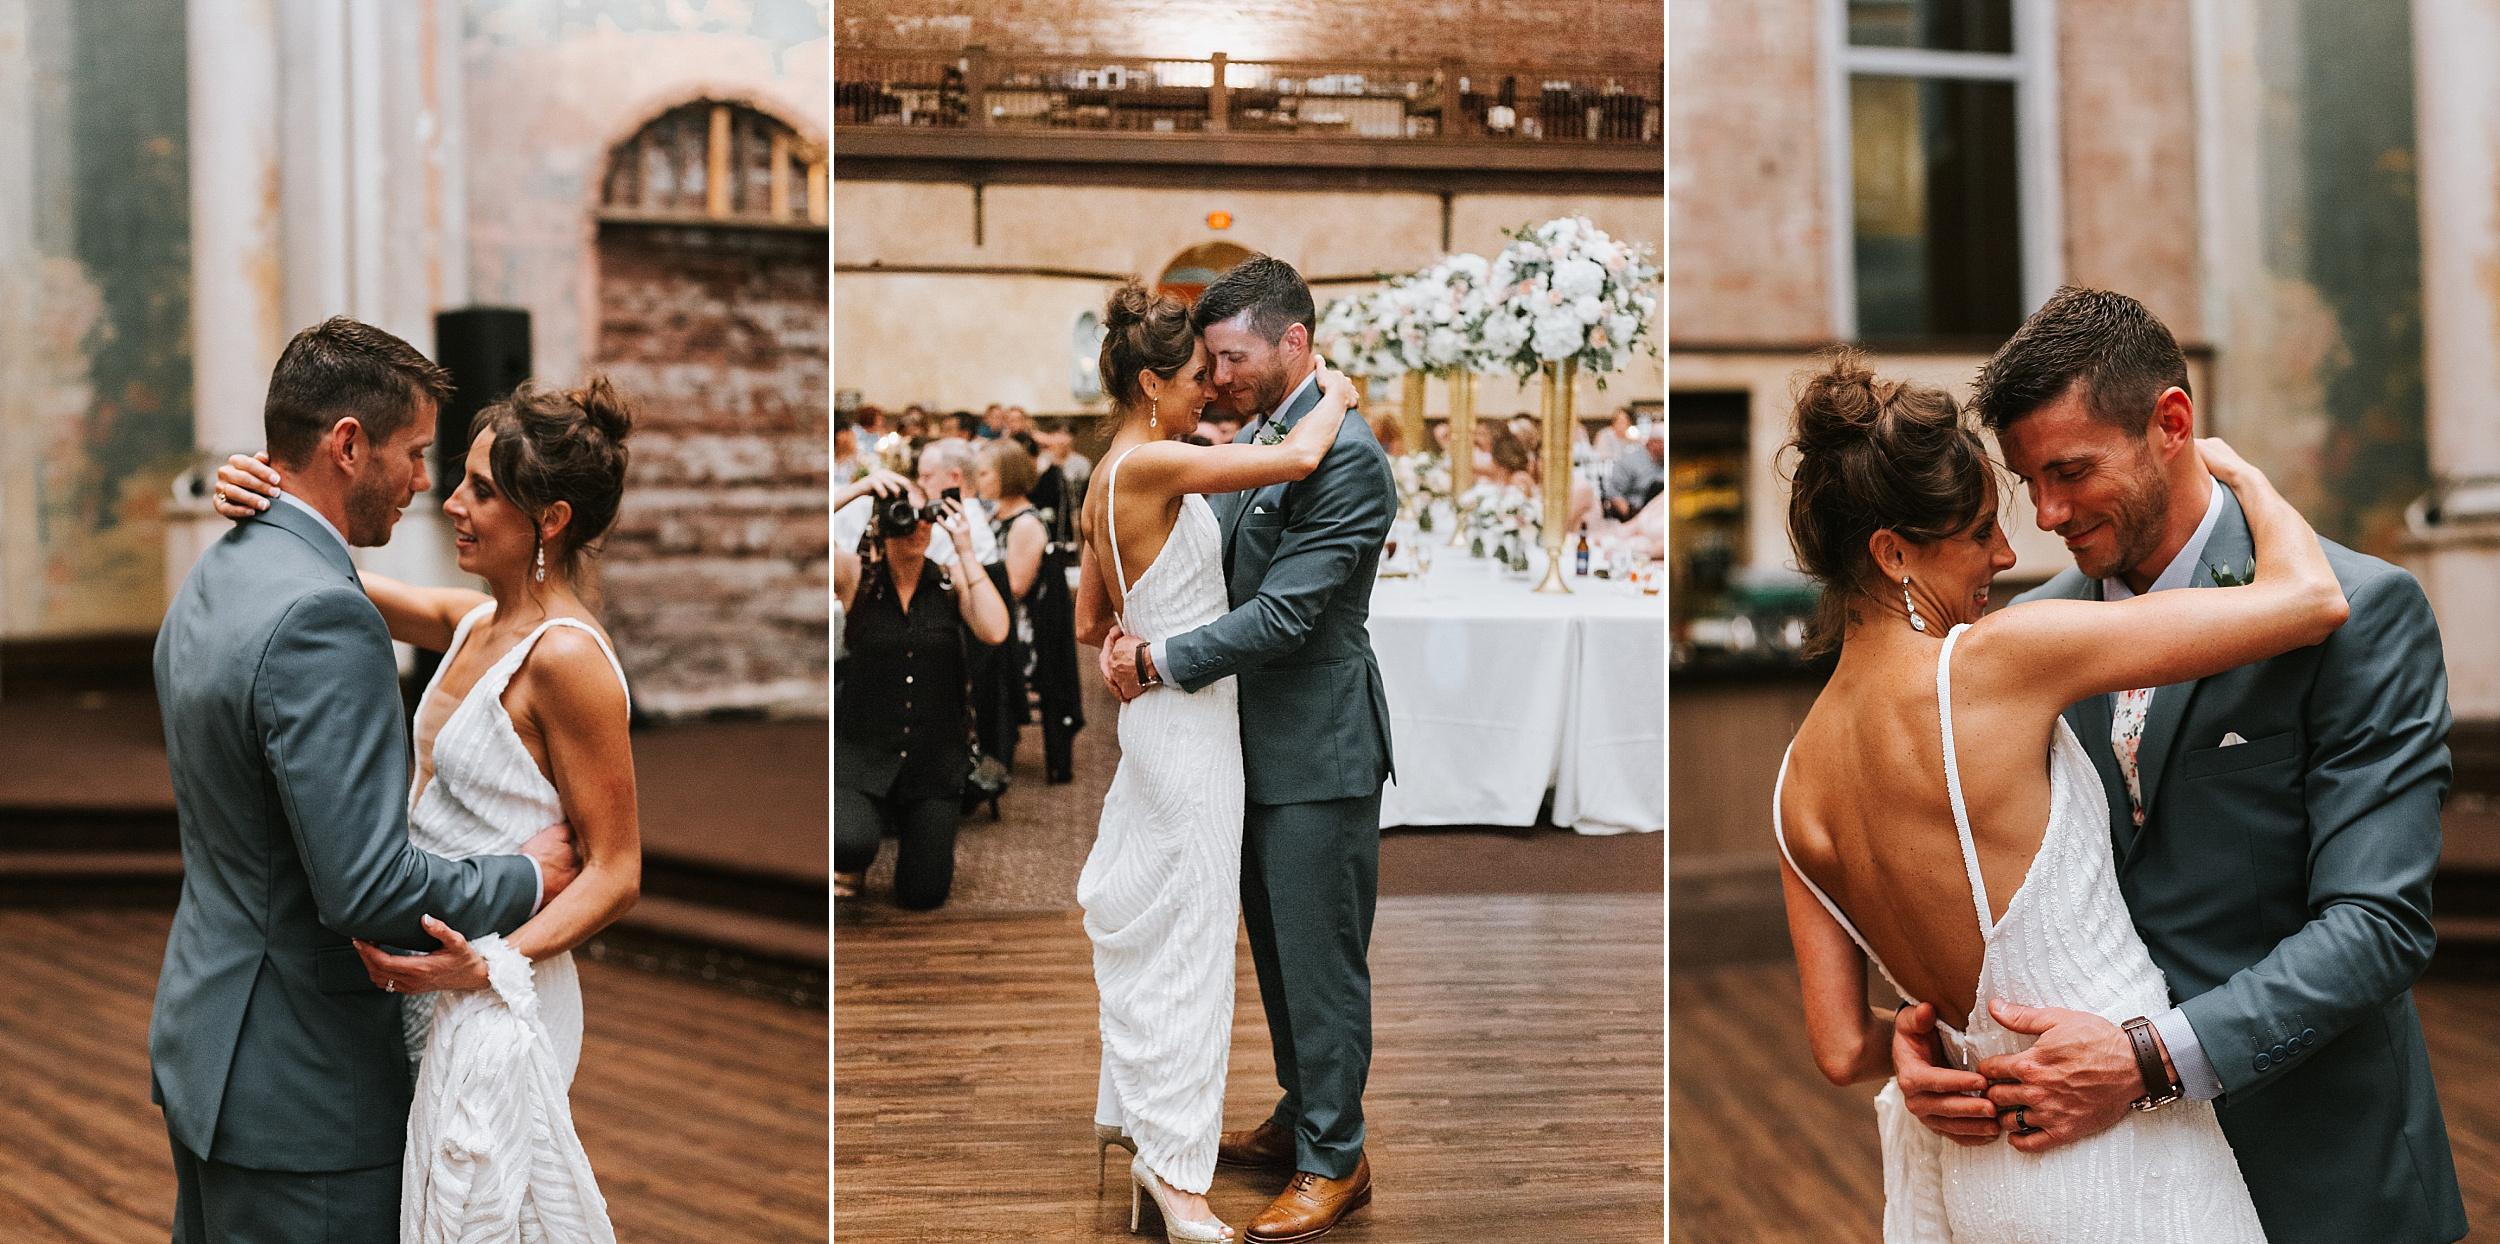 Brooke Townsend Photography - Cincinnati Wedding Photographer (157 of 170).jpg